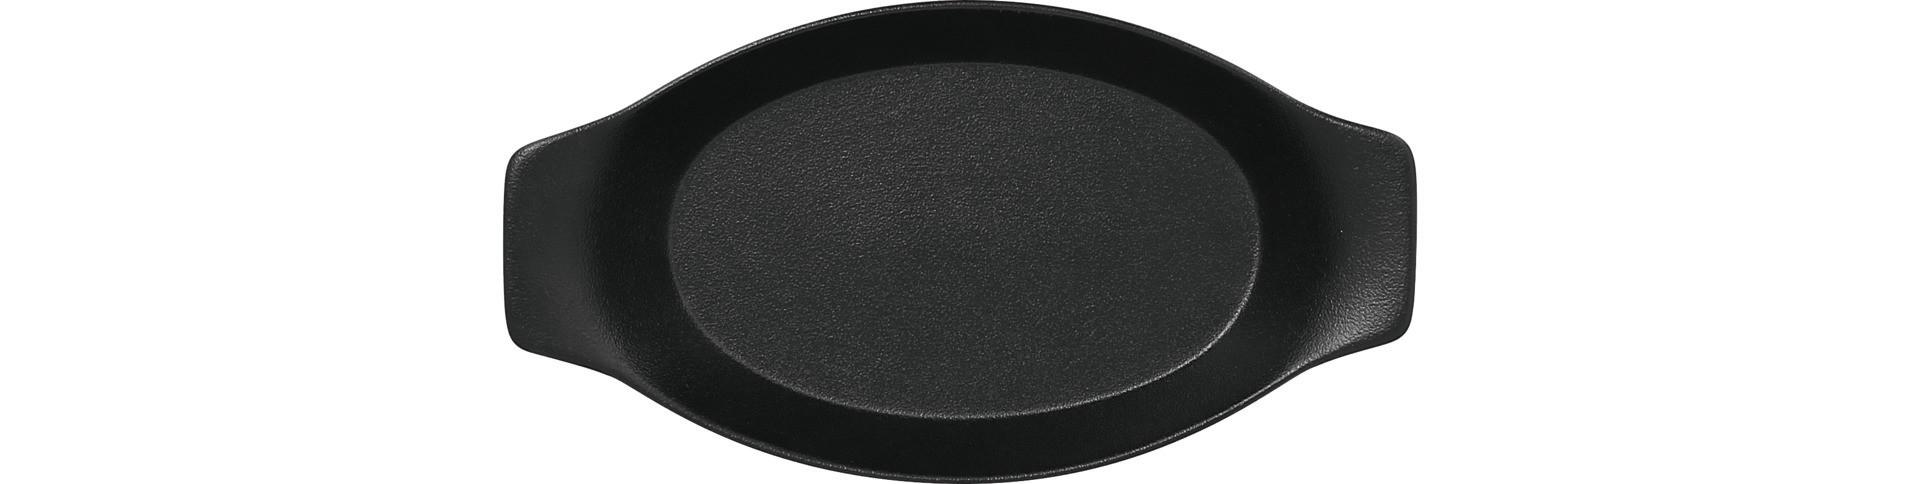 Neofusion, Schale oval mit Griffen 250 x 140 mm / 0,42 l volcano